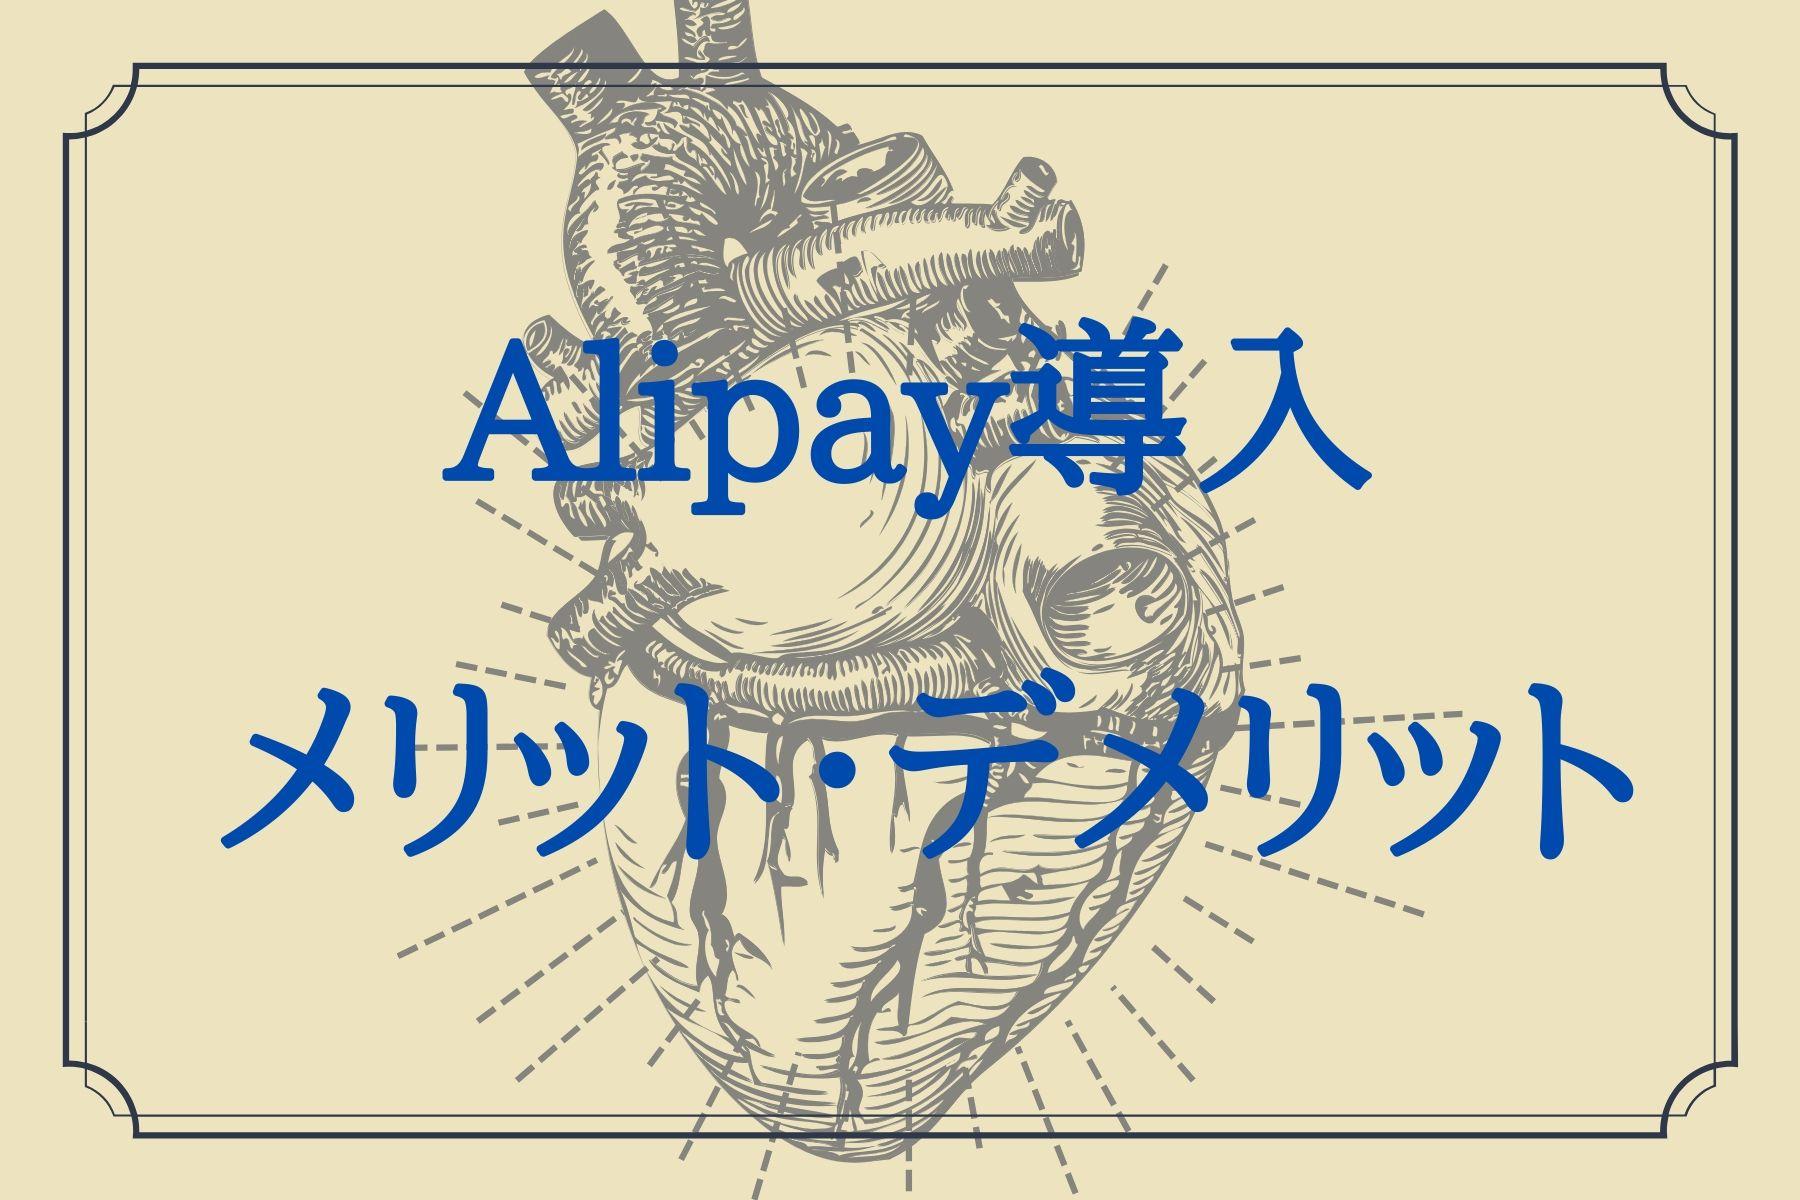 Alipay(アリペイ)を導入する3つのメリット・2つのデメリット【飲食店向け】